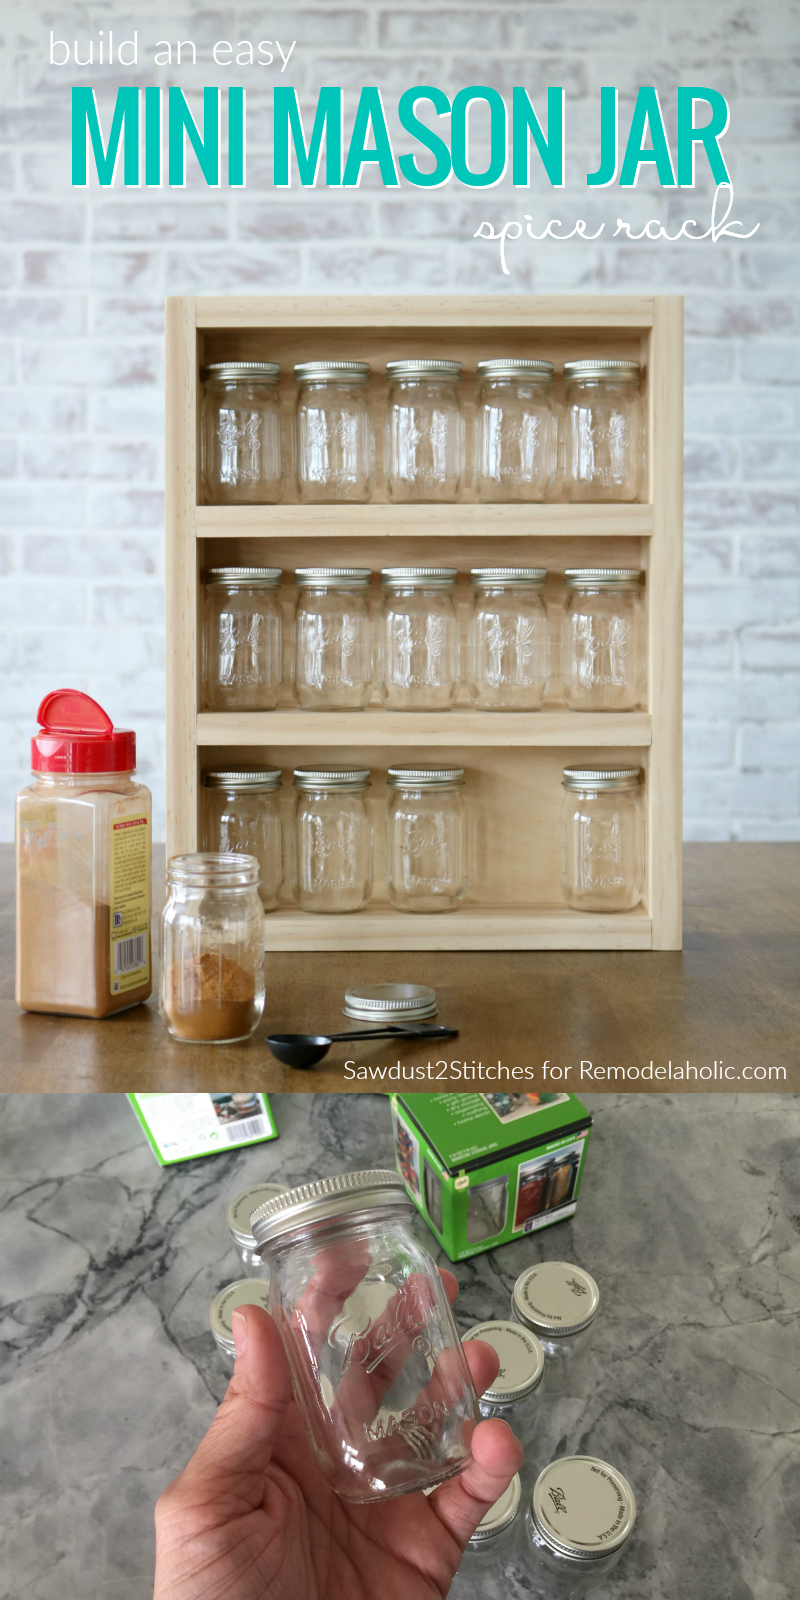 Build An Easy Mini Mason Jar Spice Rack Shelf For Storage And